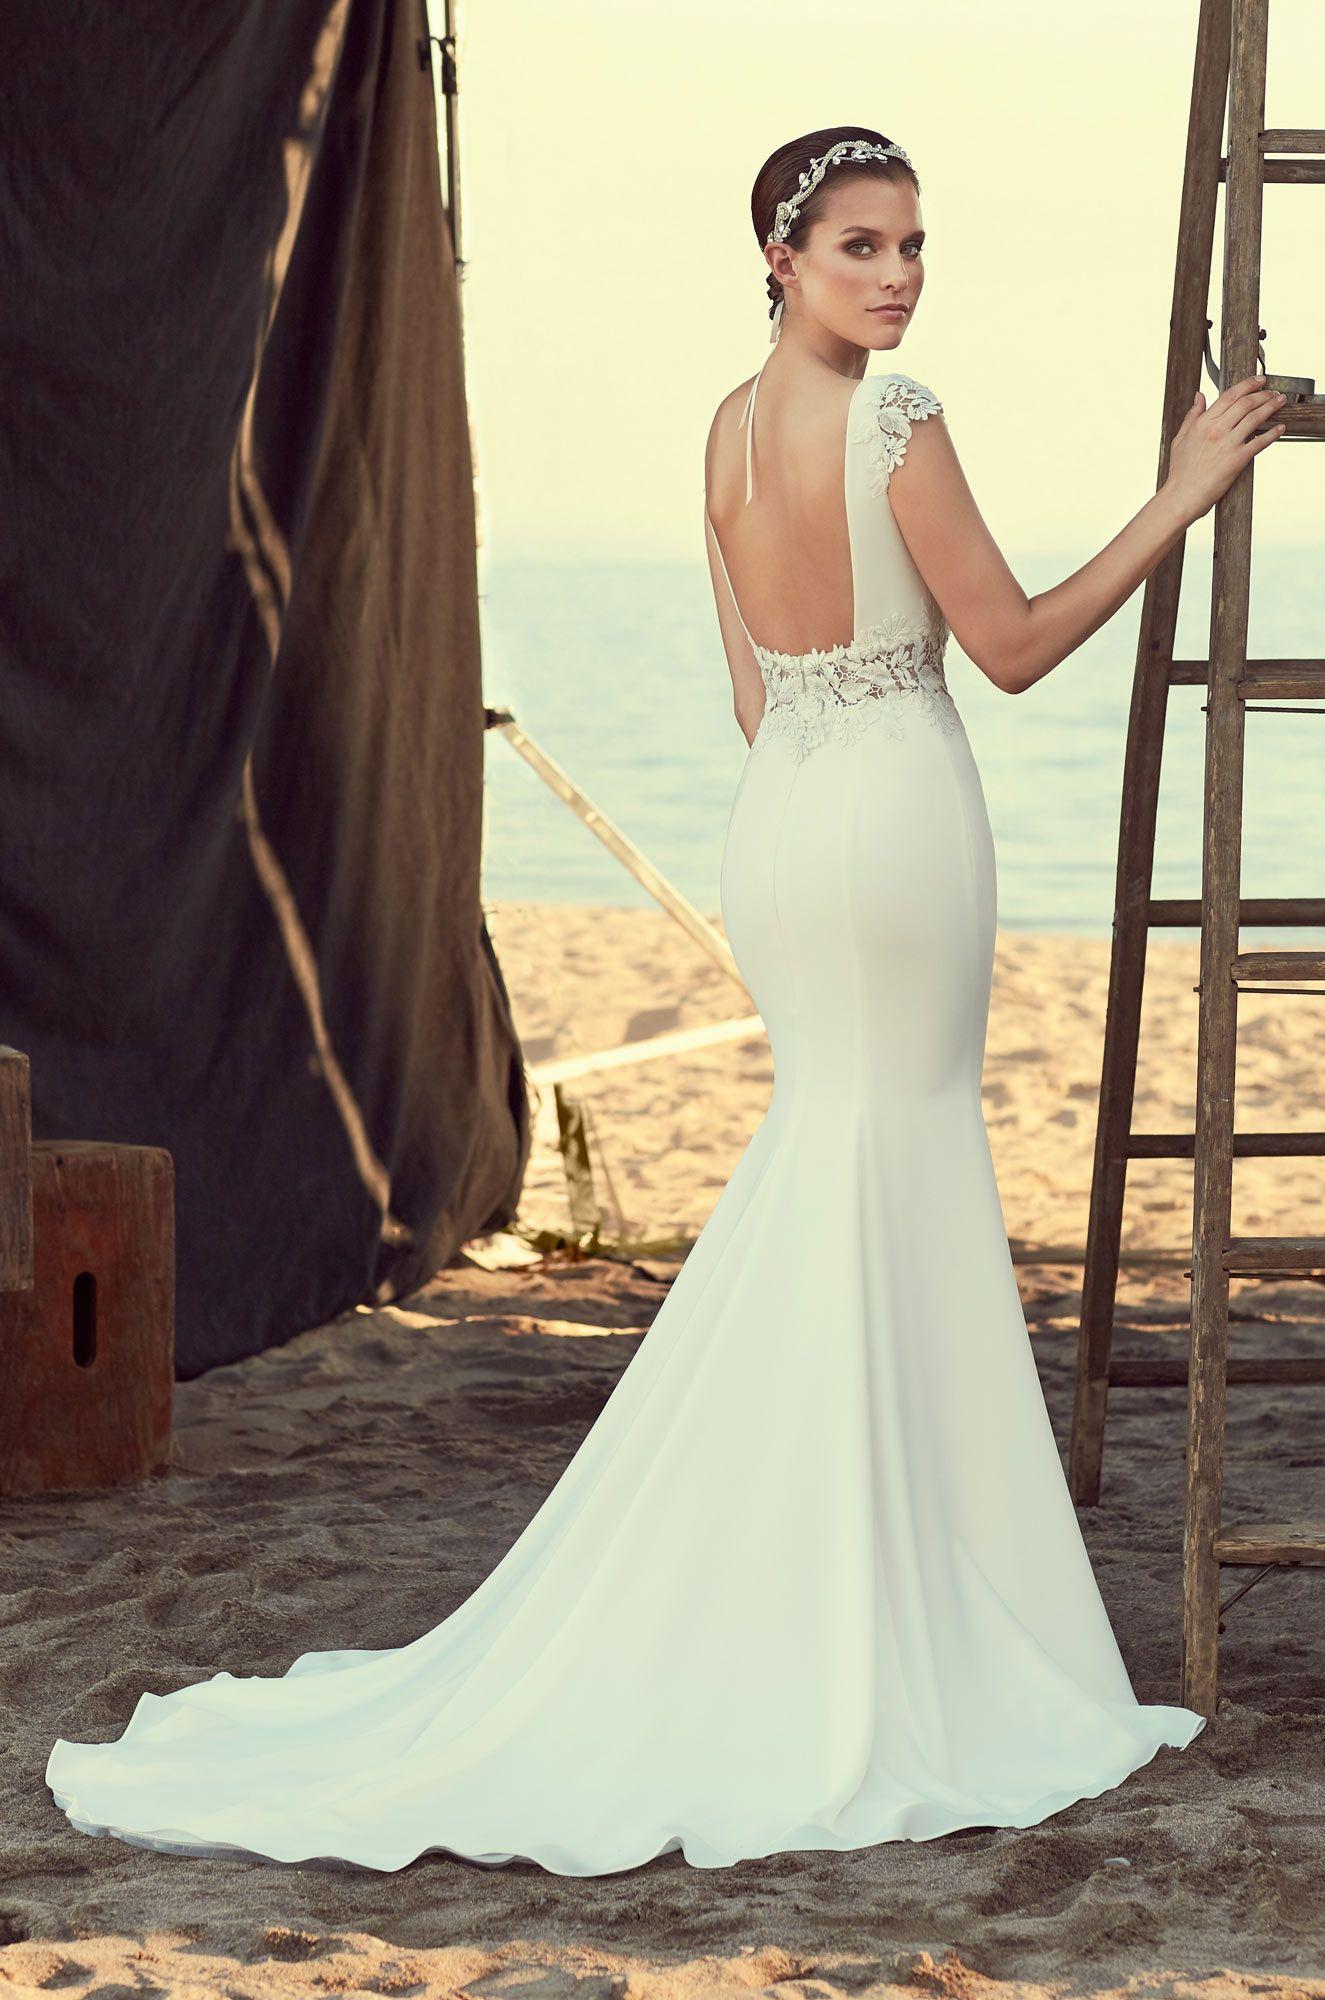 Sheer midriff wedding dress style in wedding dresses